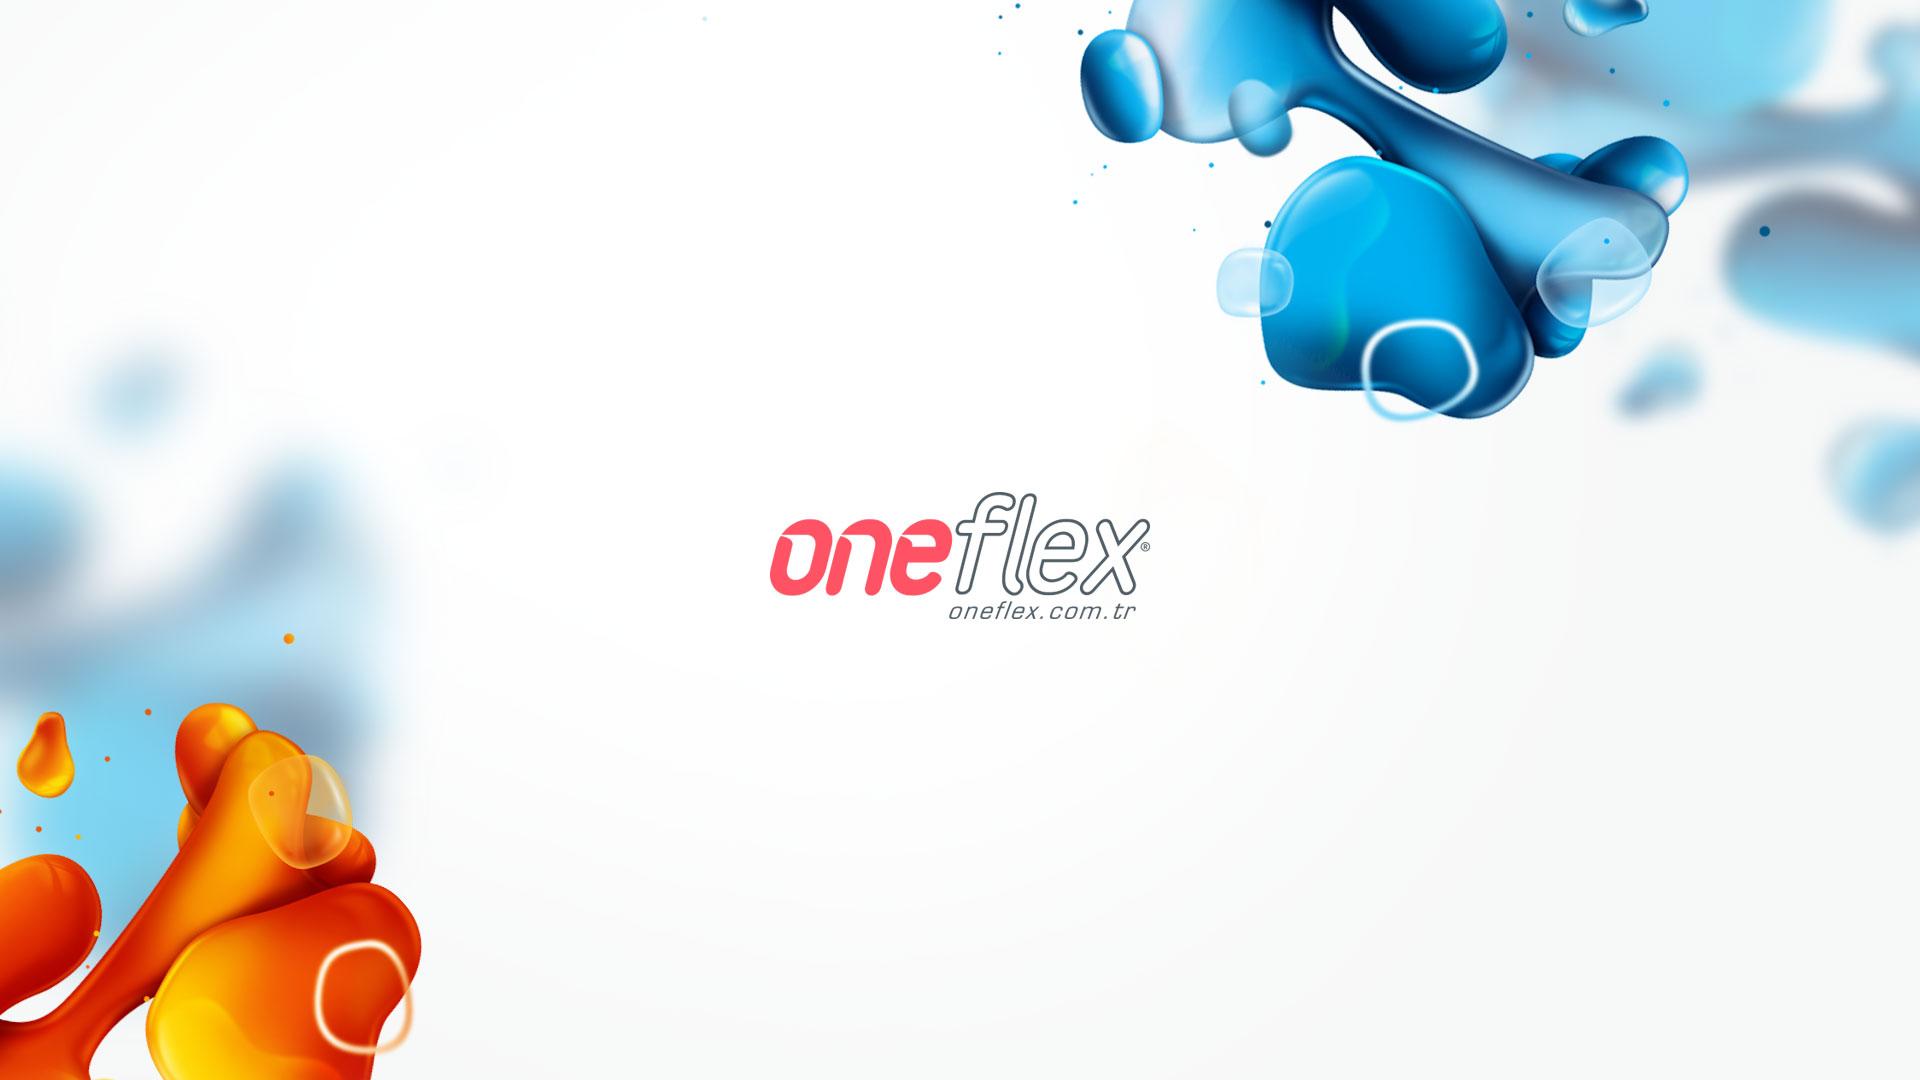 oneflex_02